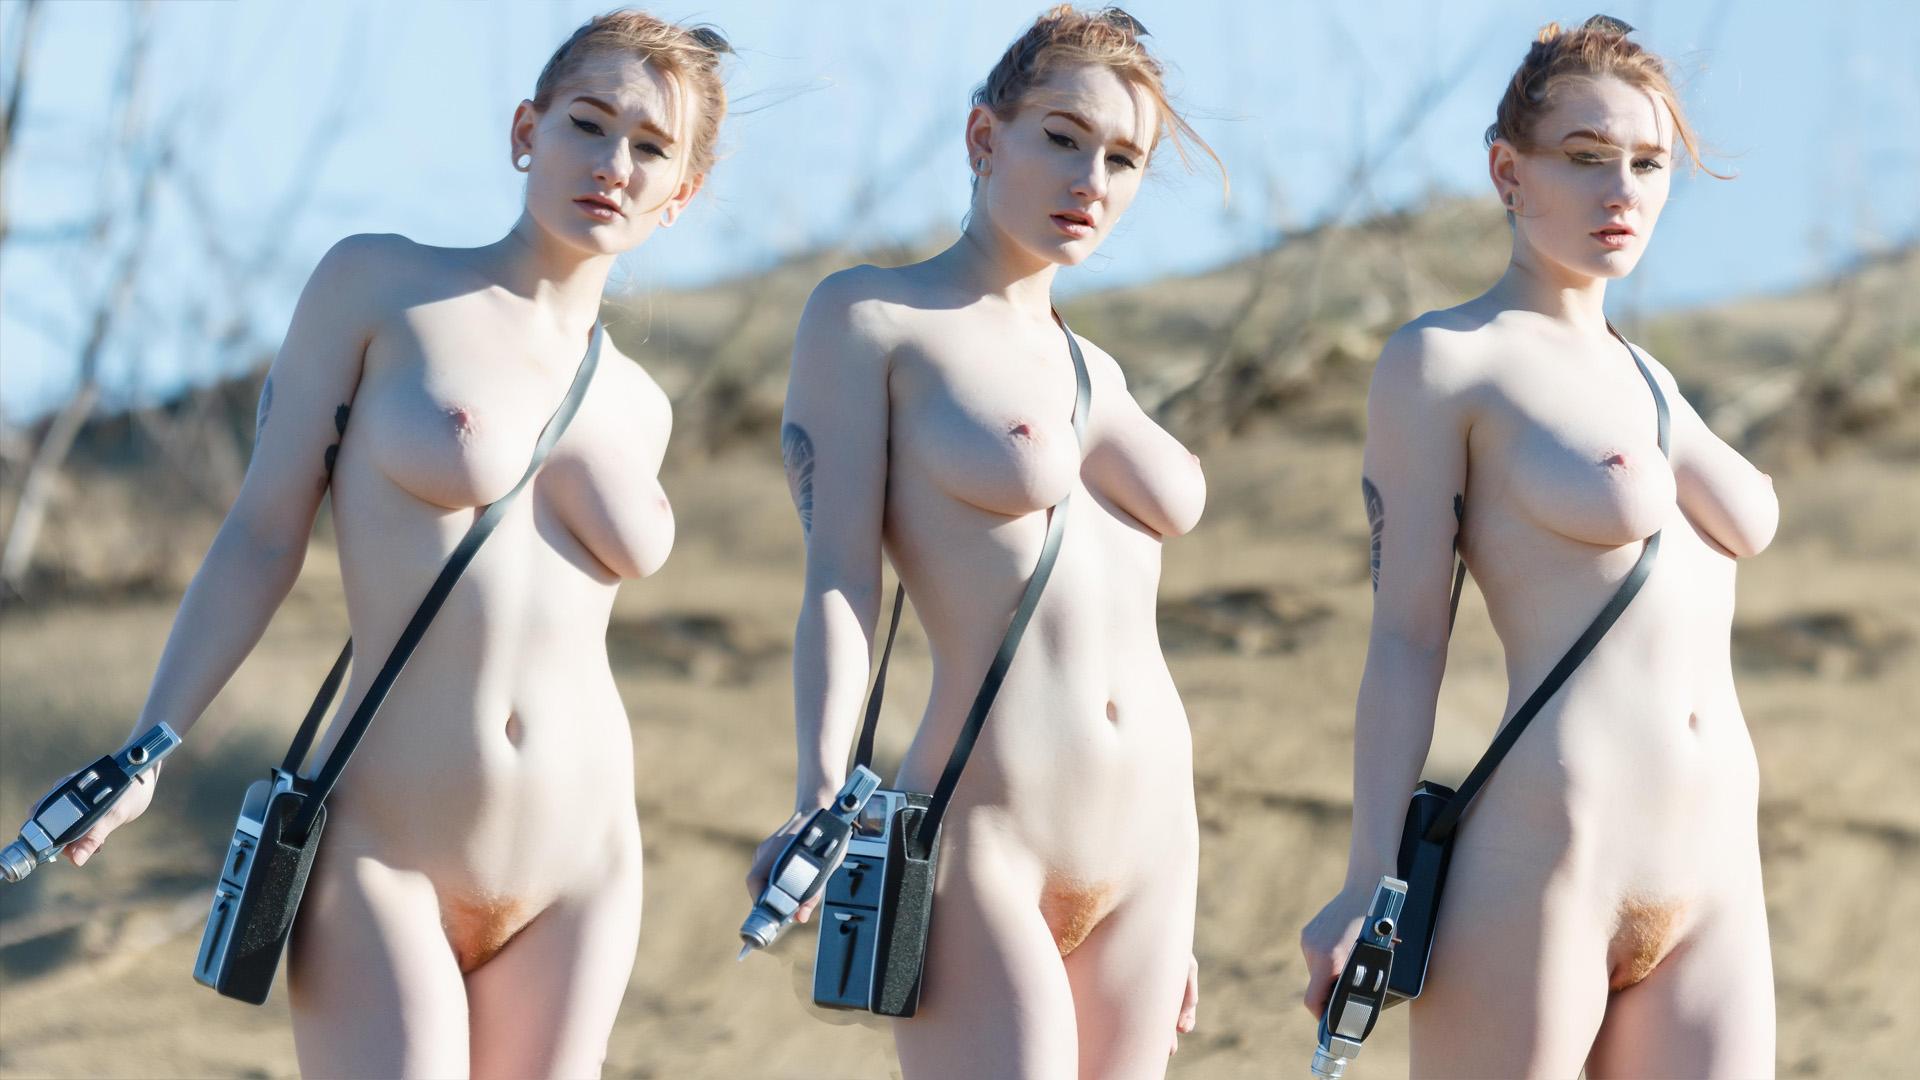 Hot Male Lifeguards Nude